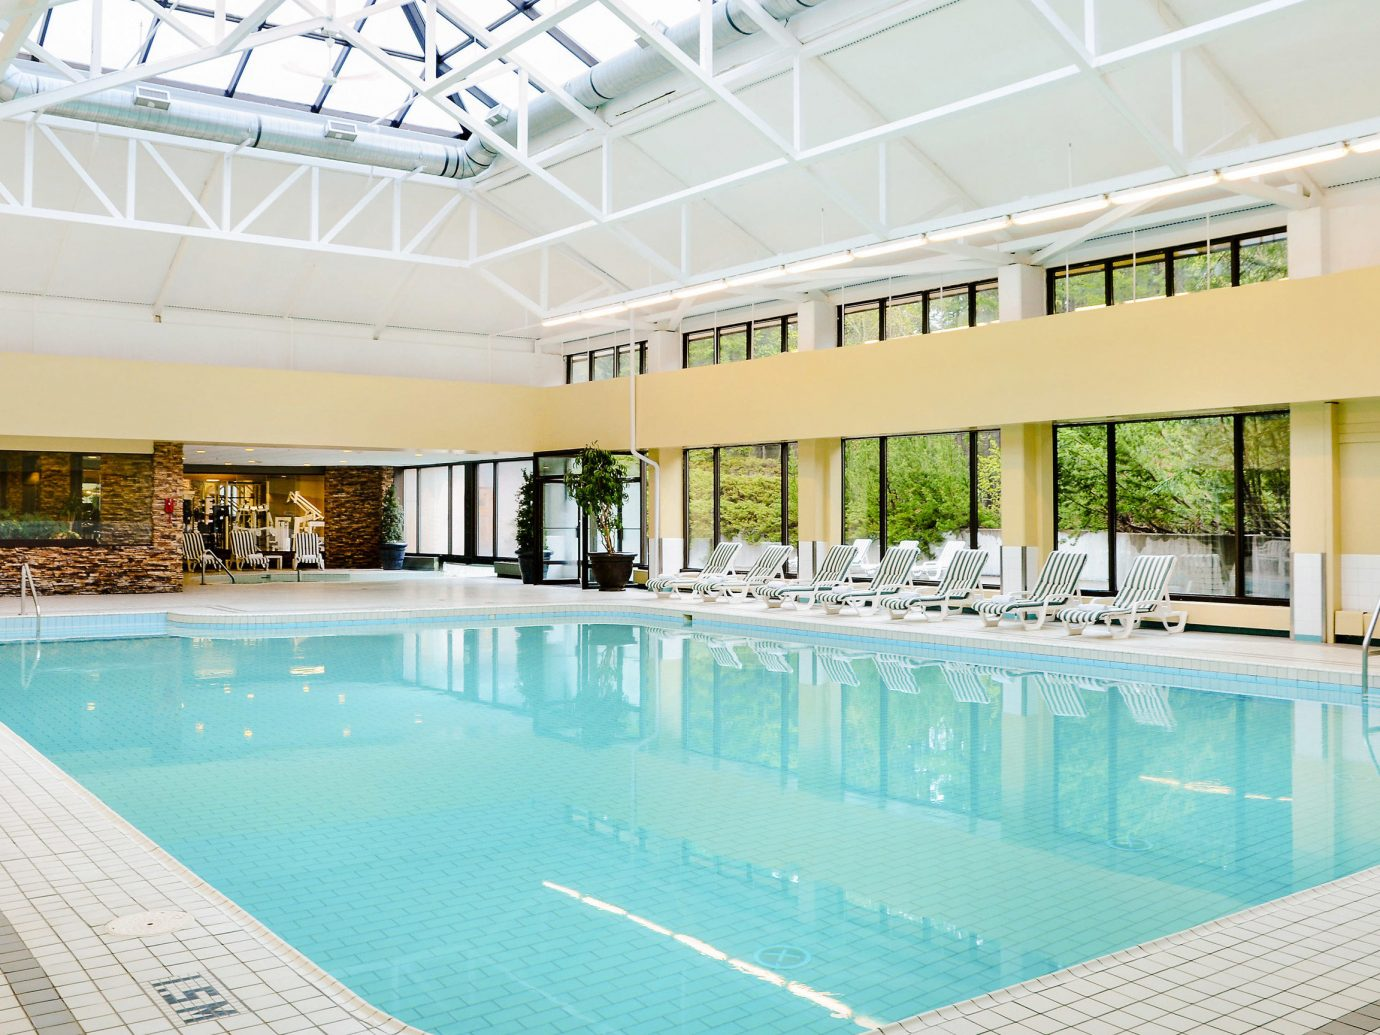 Alberta Boutique Hotels Canada Hotels swimming pool leisure property leisure centre Resort real estate estate hotel condominium resort town apartment recreation amenity vacation